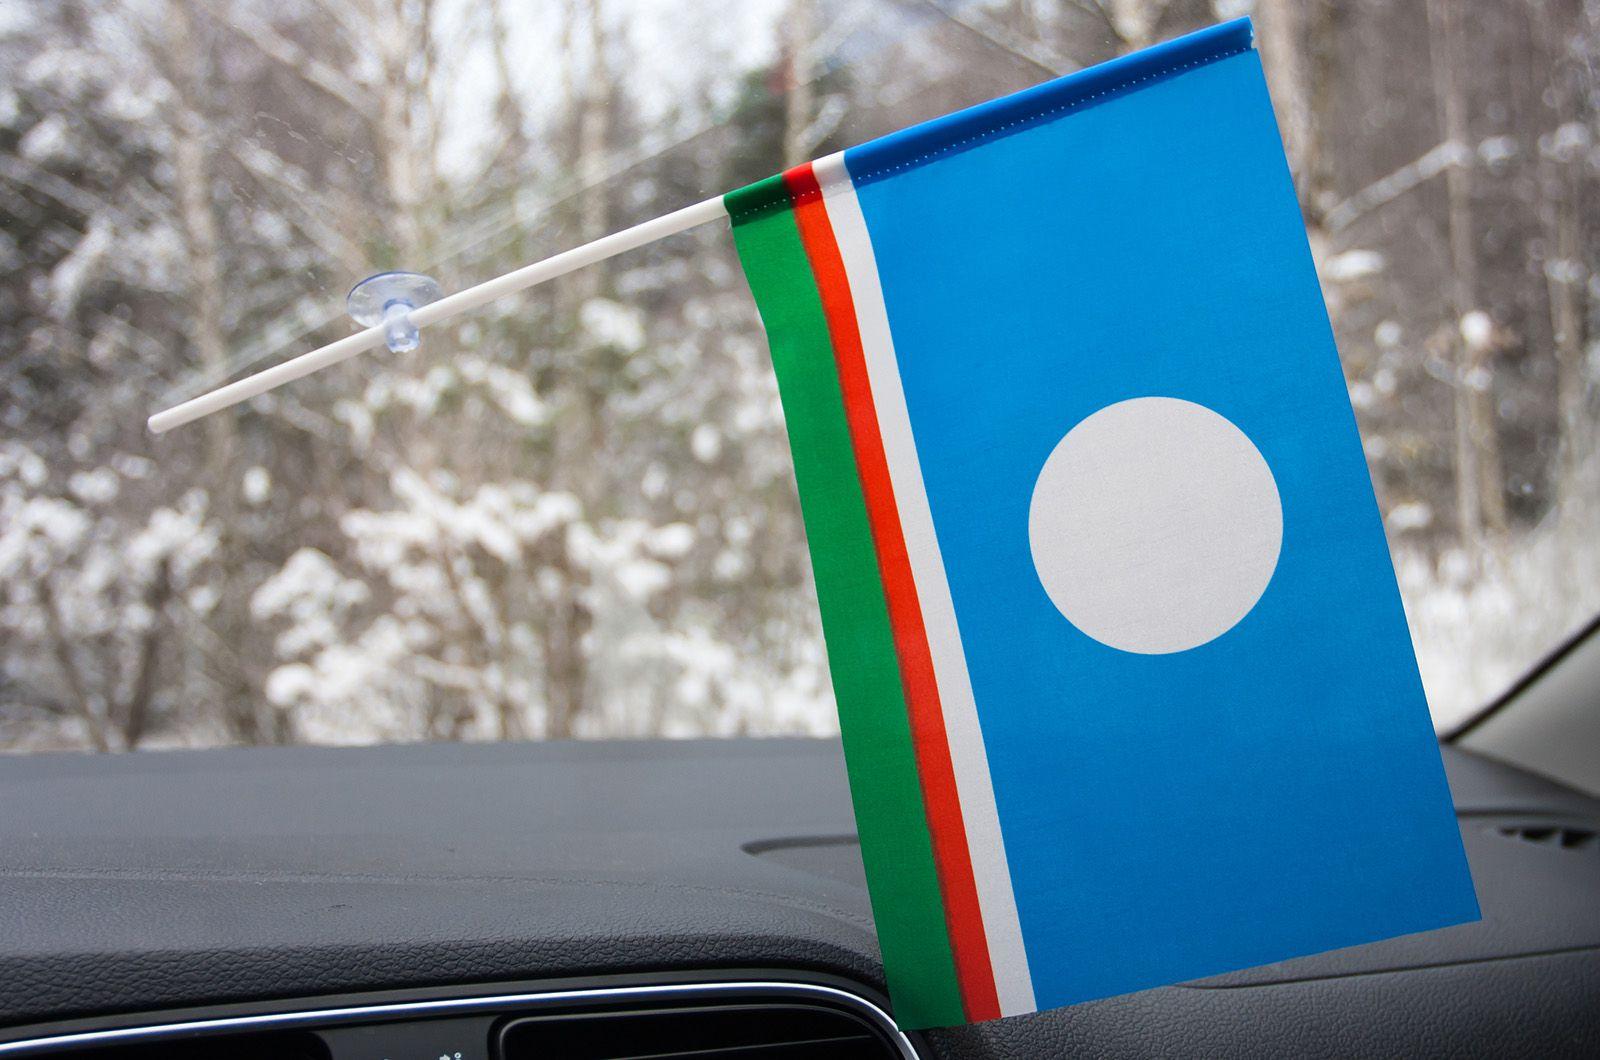 Флажок Якутии в машину